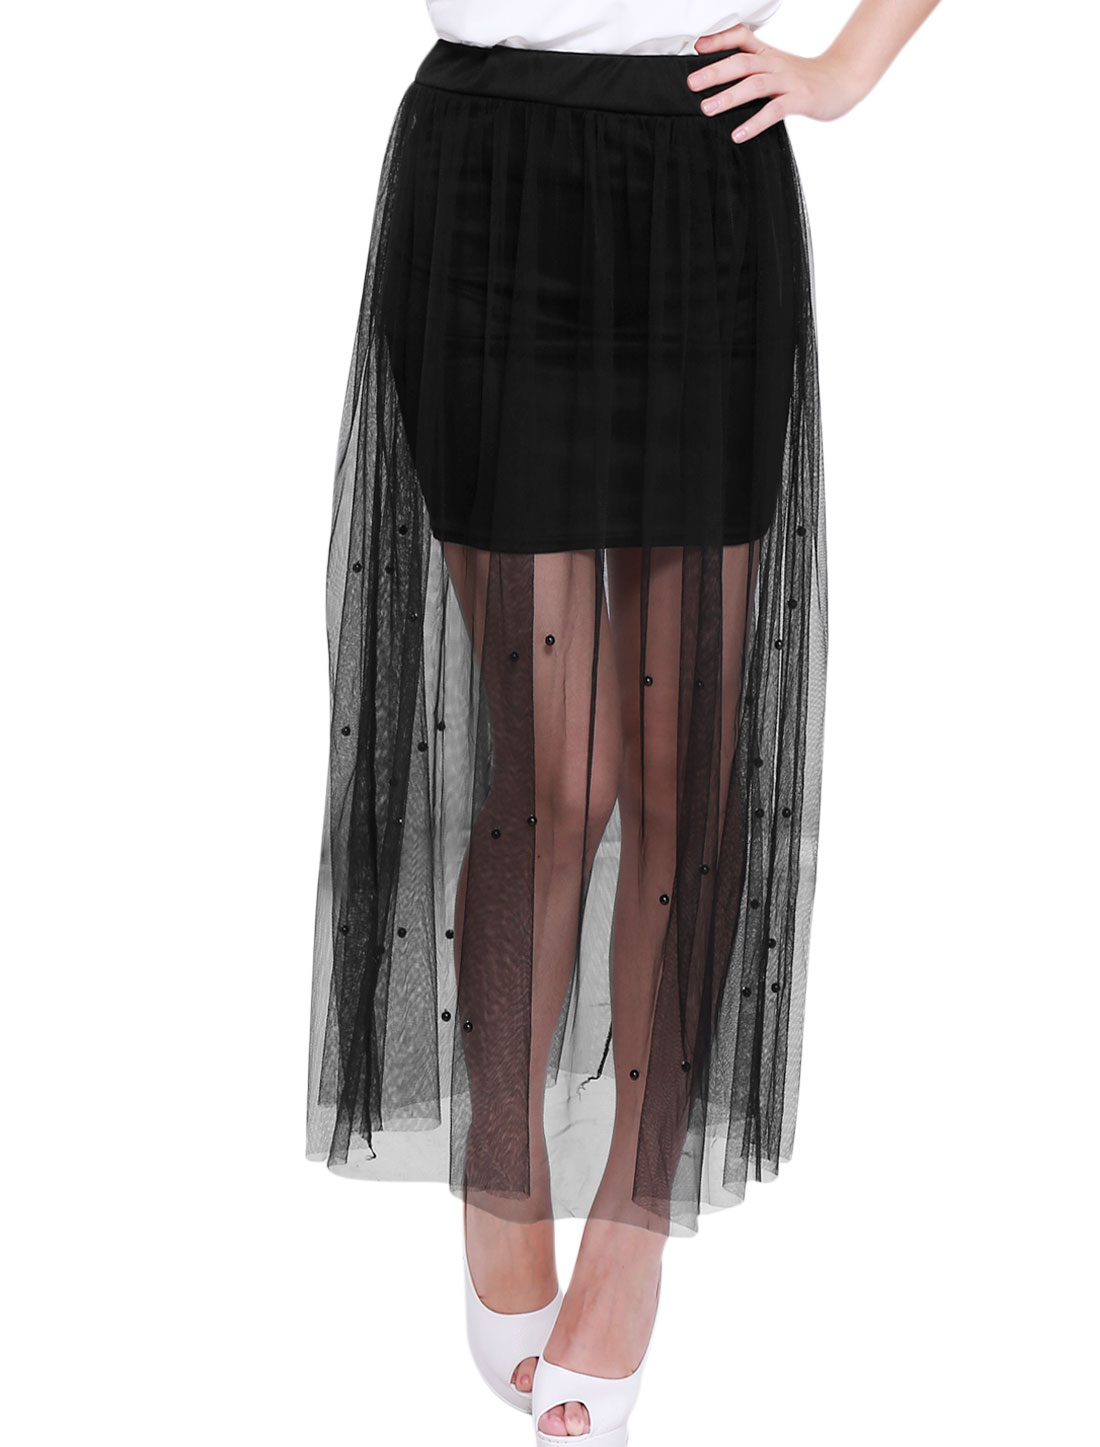 Ladies Sweet Plastic Pearl Decor Elastic Waist Semi Sheer Mesh Skirt Black XS